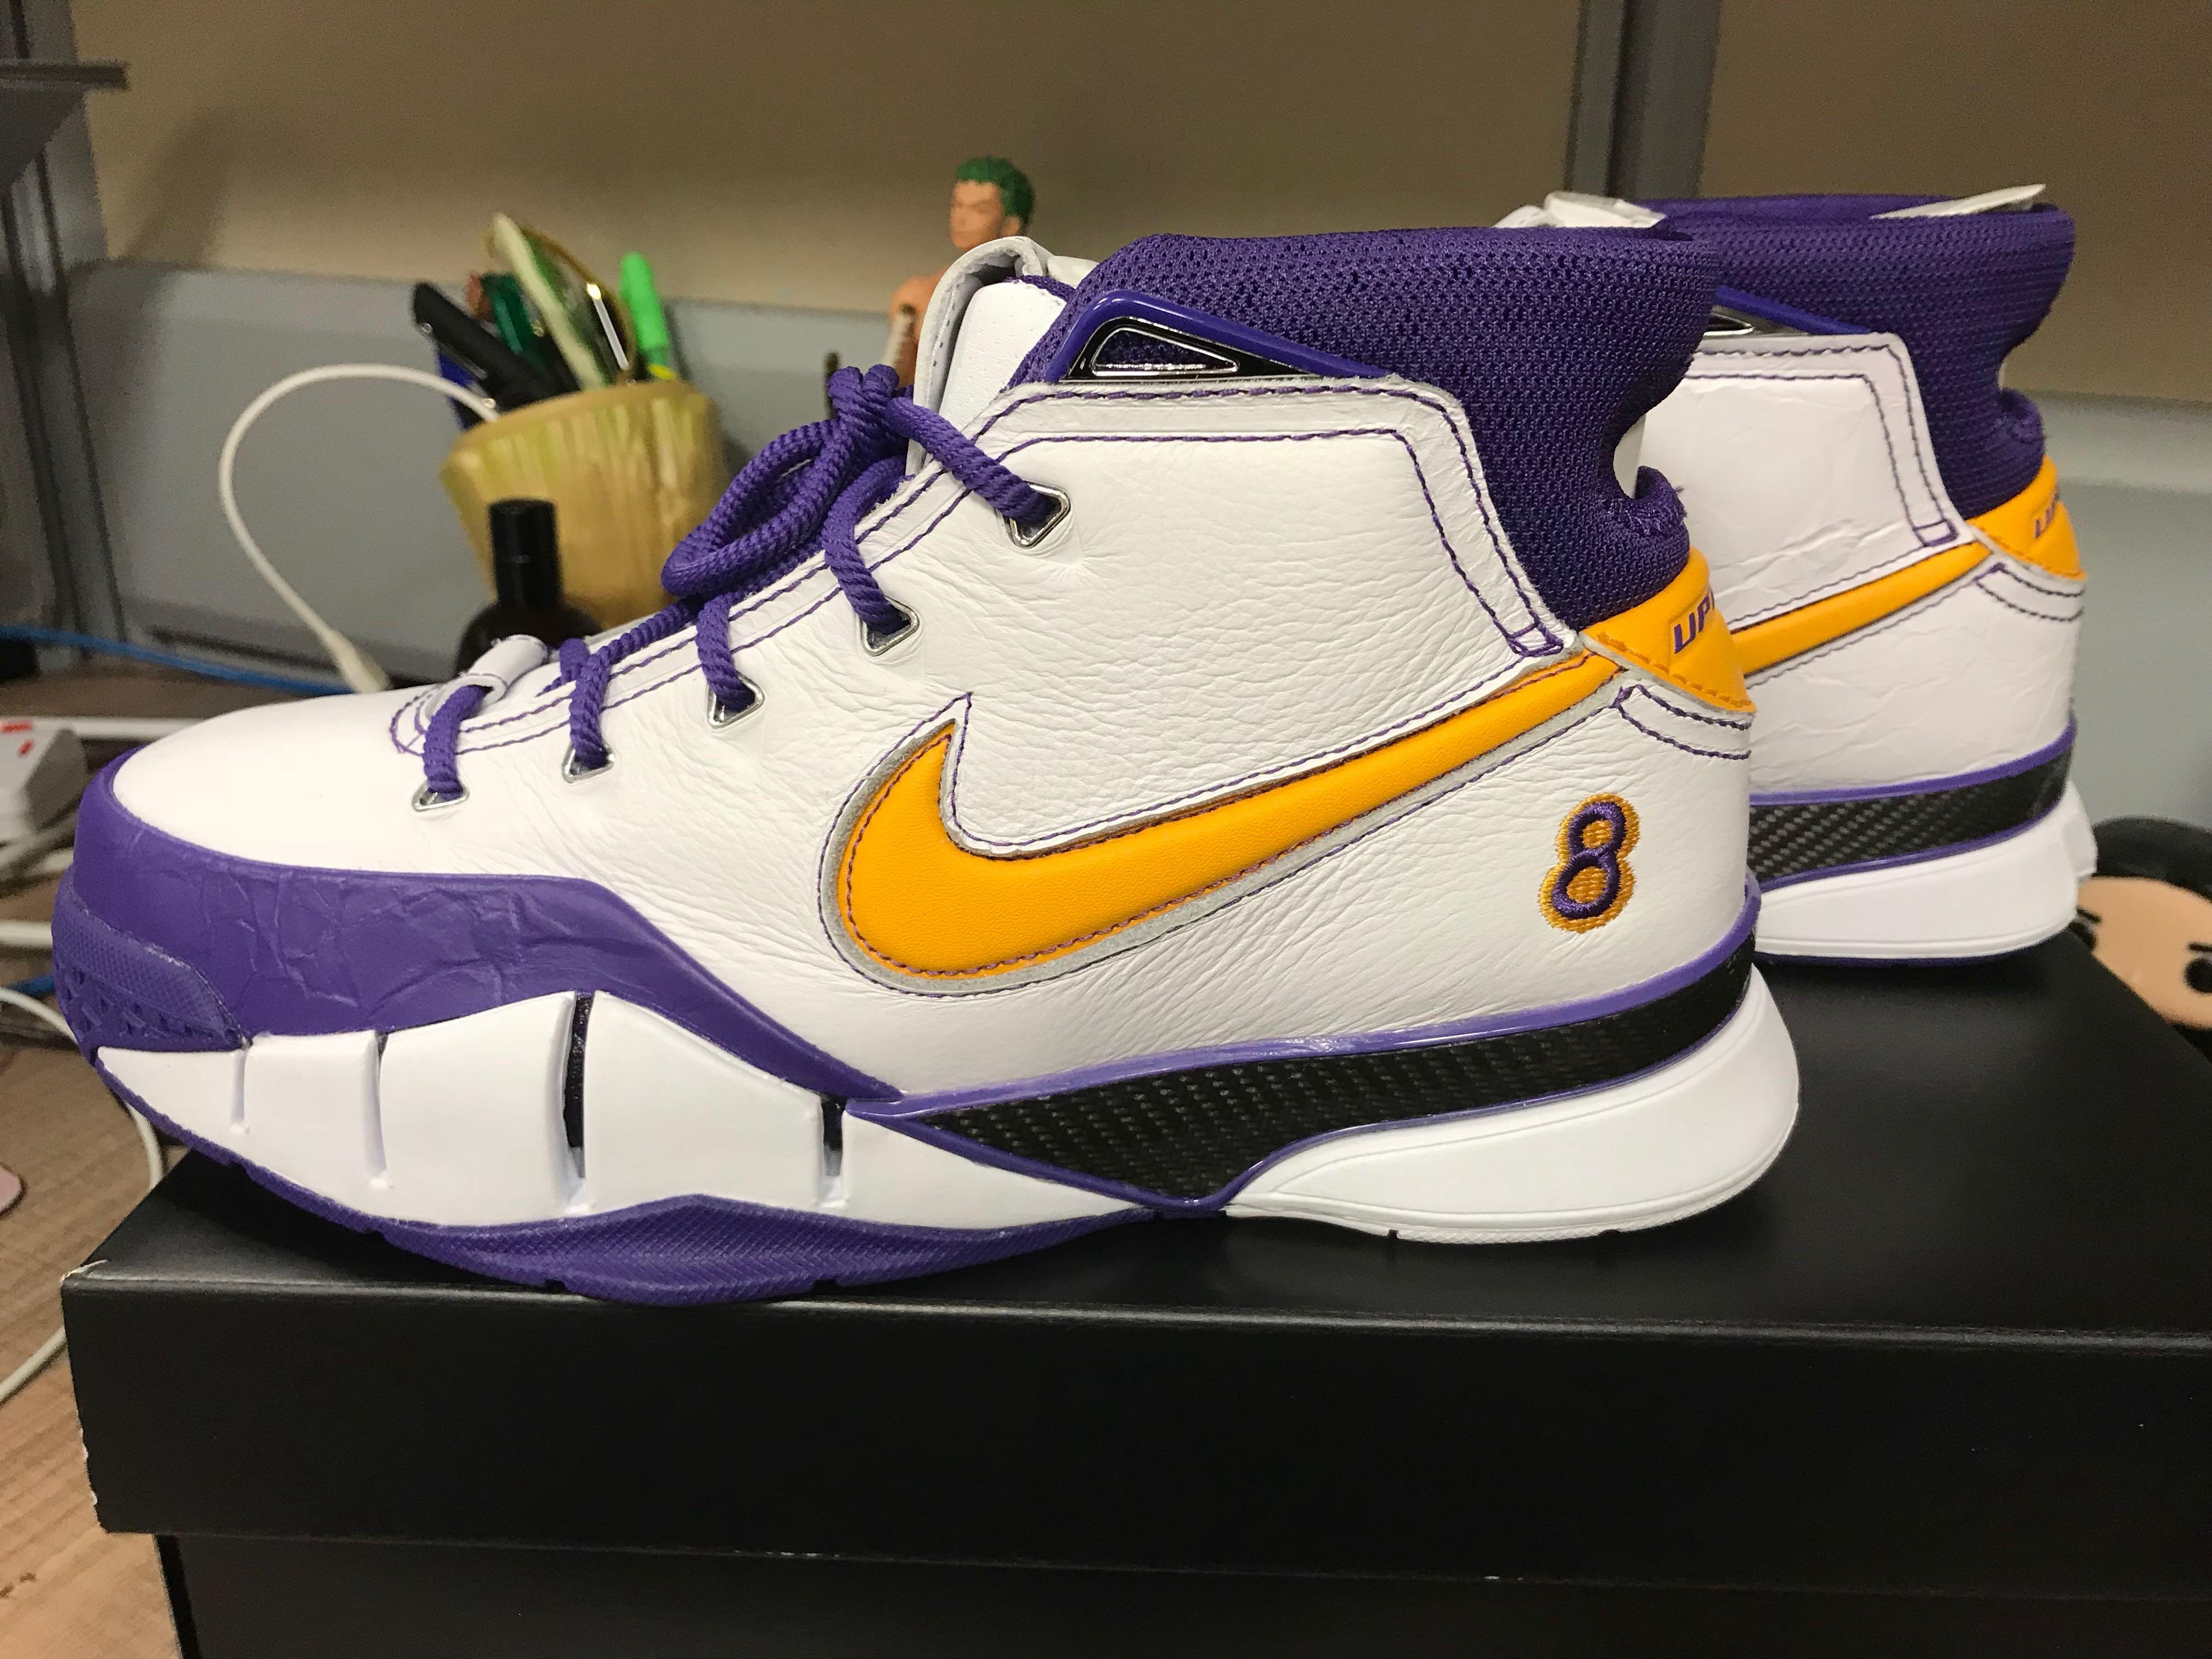 quality design ae9e7 b8b17 ... cheap kobe protro nike zoom air size 7us for sale or trade mens fashion  footwear sneakers